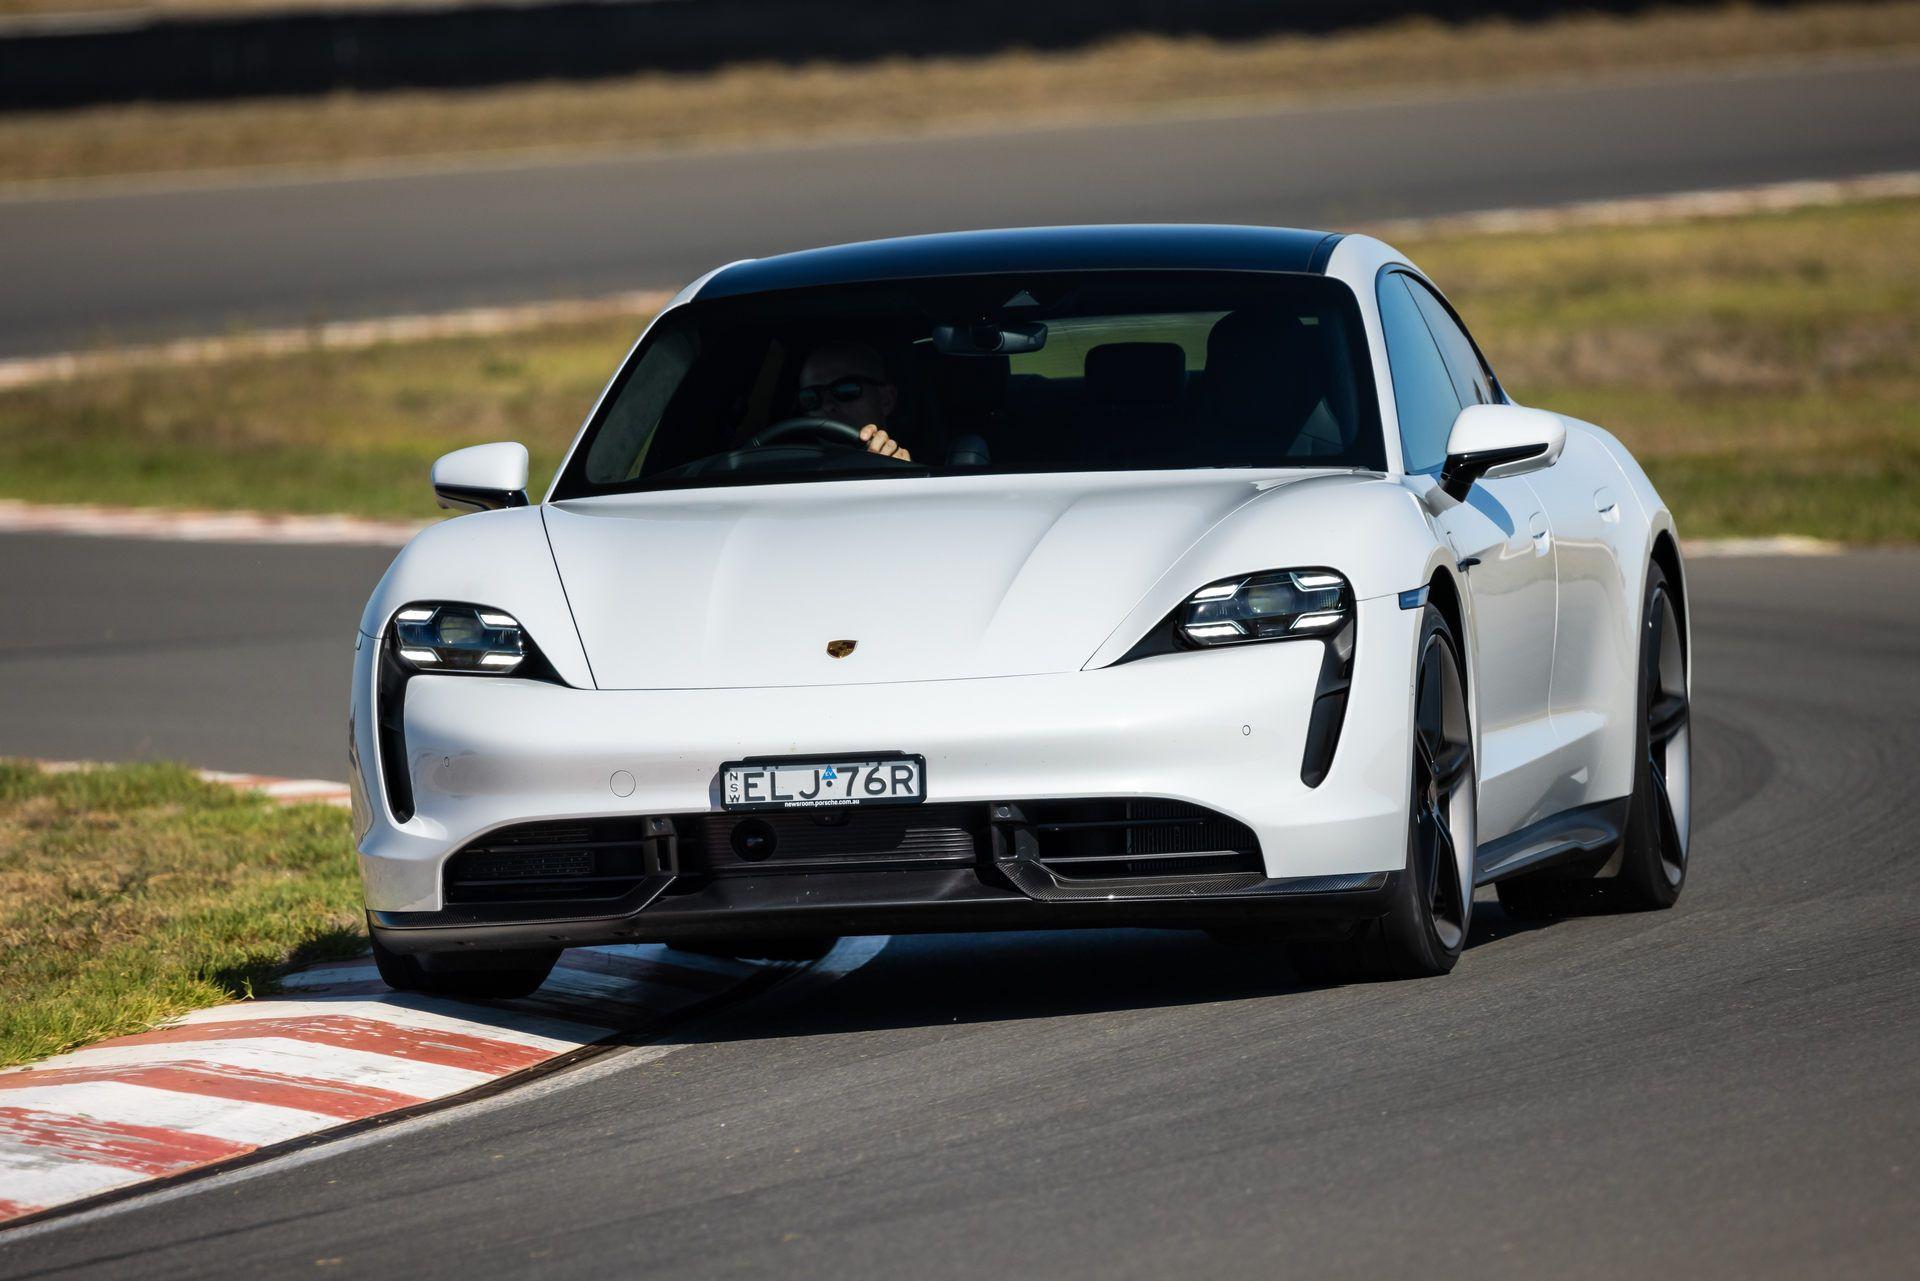 Porsche-Taycan-Turbo-S-The-Bend-Motorsport-Park-29